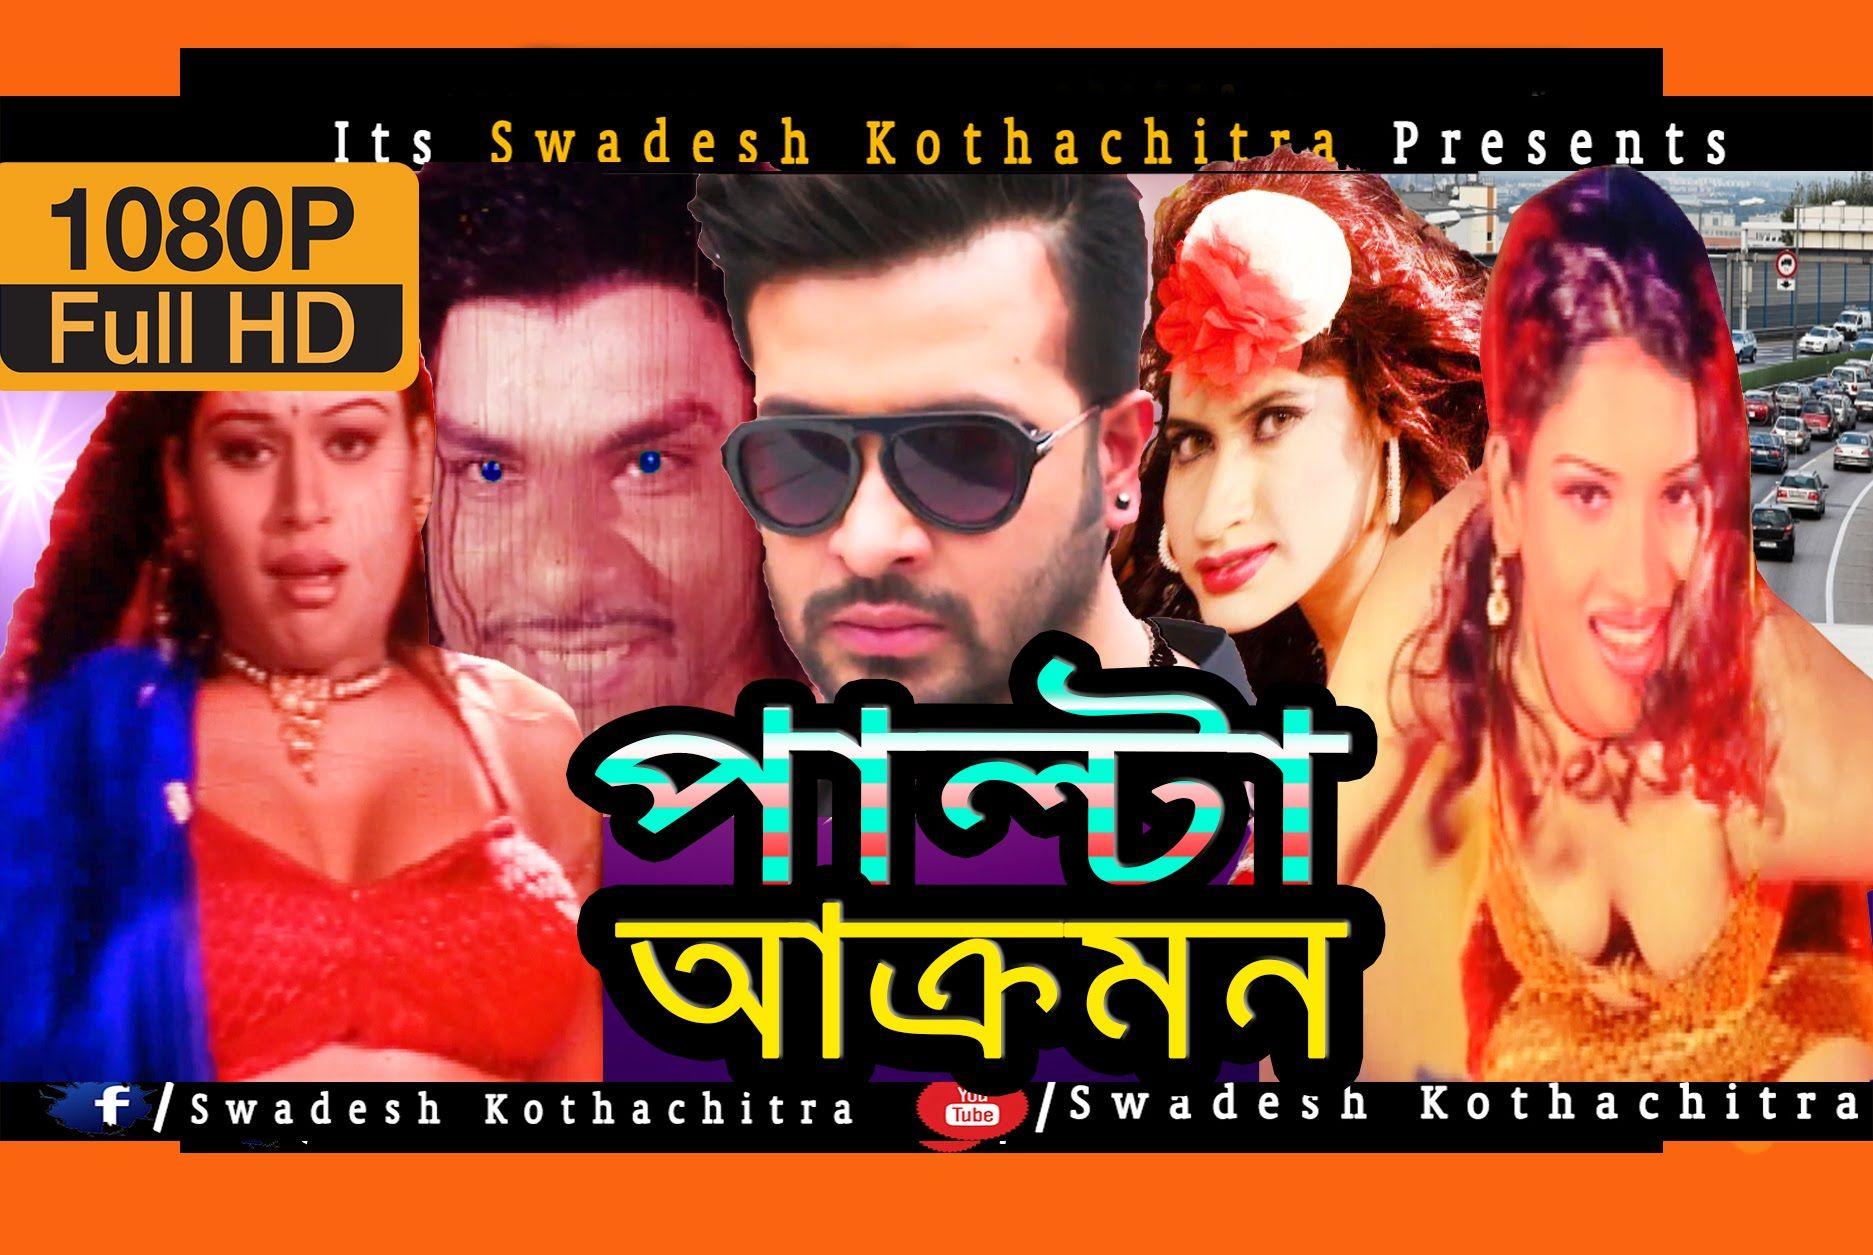 Pin on Swadesh Kothachitra